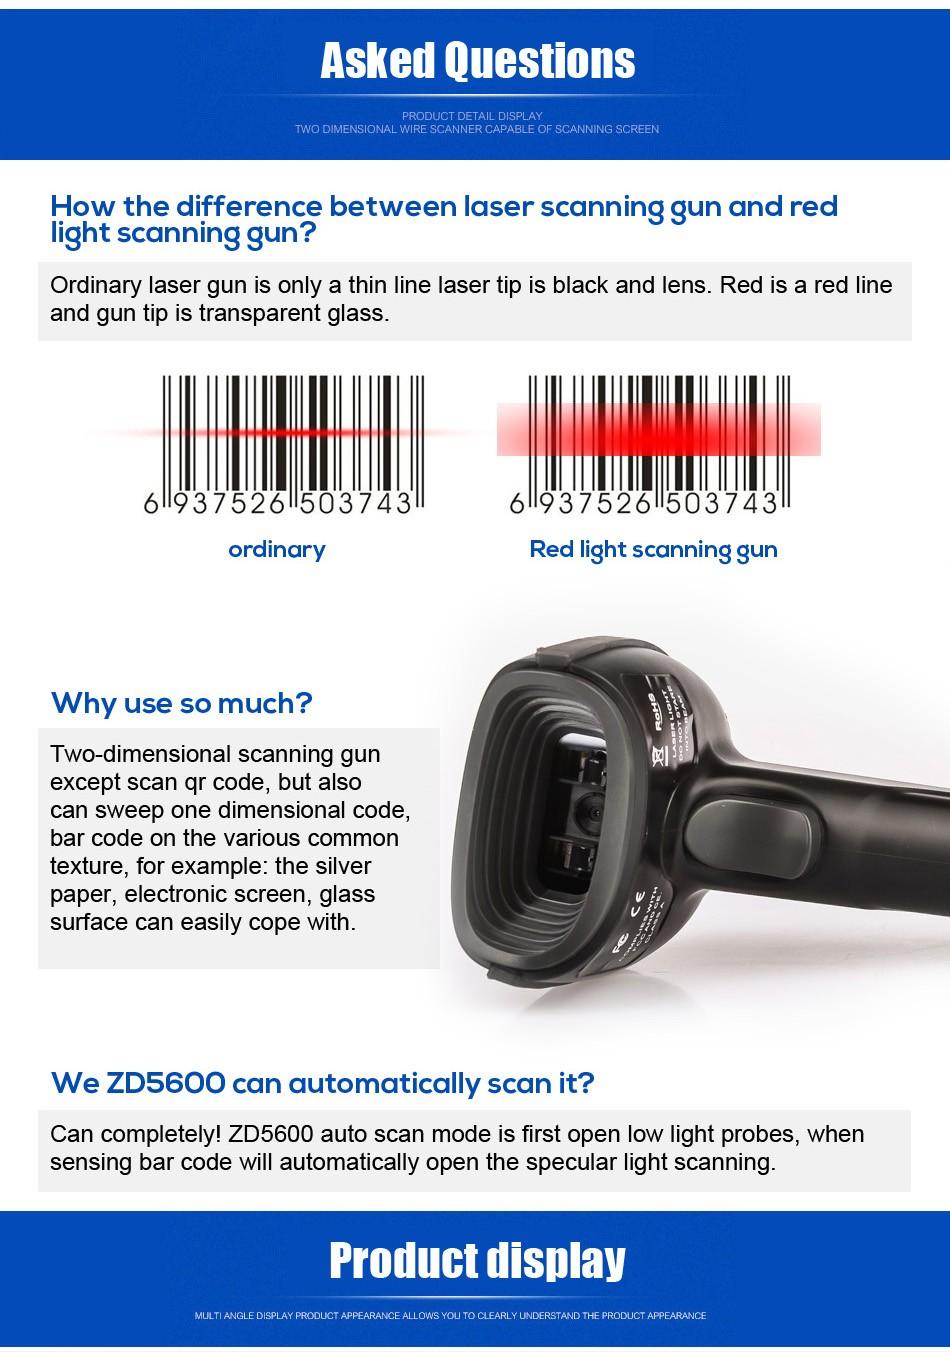 ZD5600-950-4